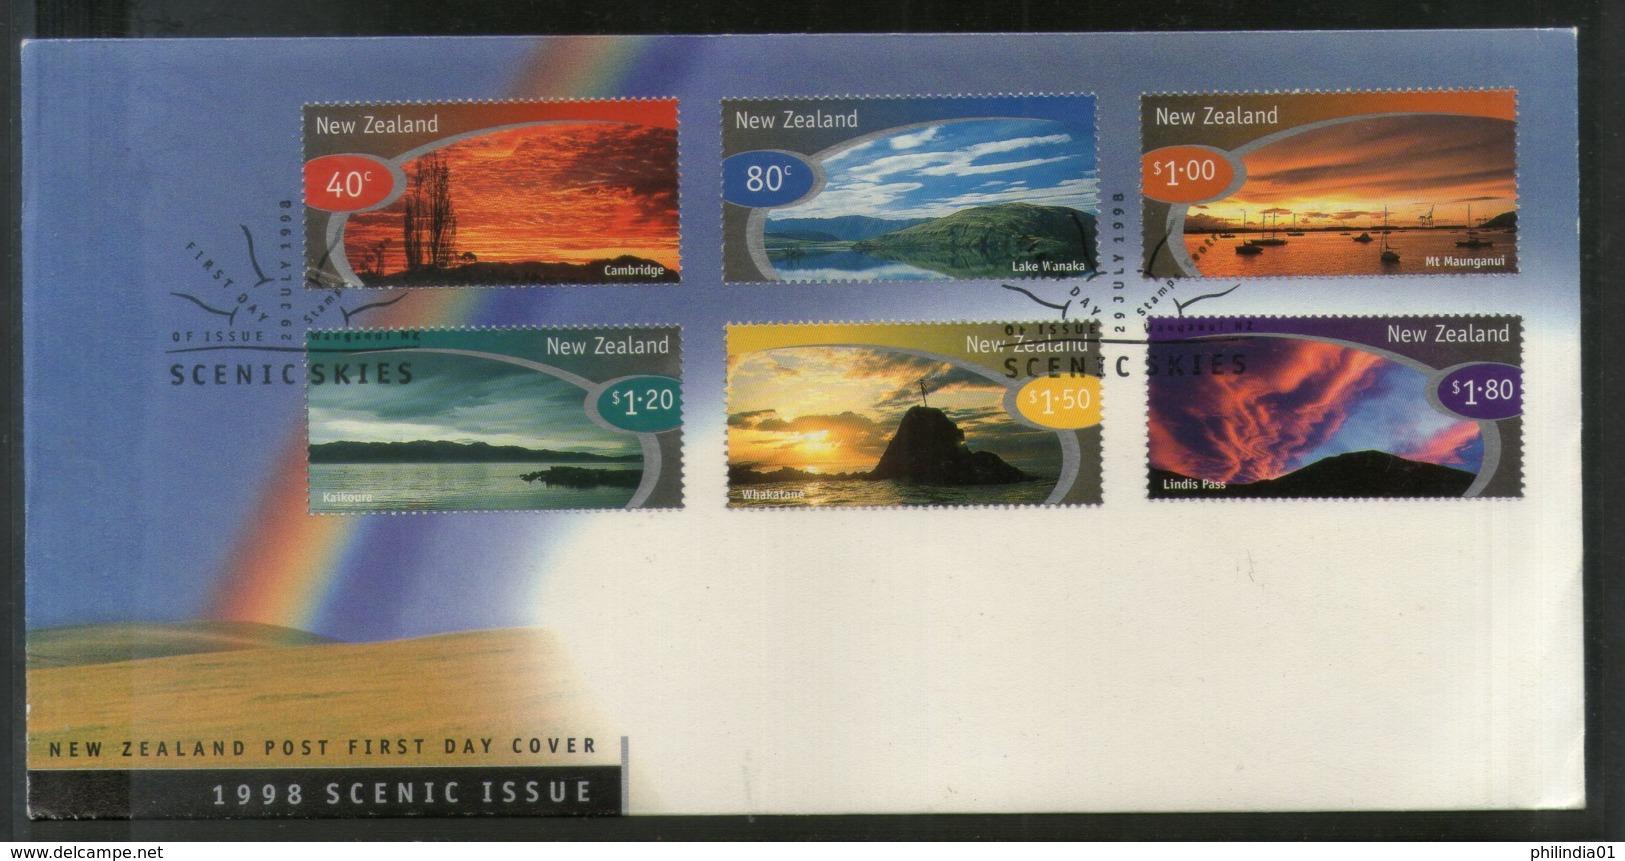 New Zealand 1998 Scenic Skies Lake Mountain Tourism Sc 1526-31 FDC # 16579 - Other